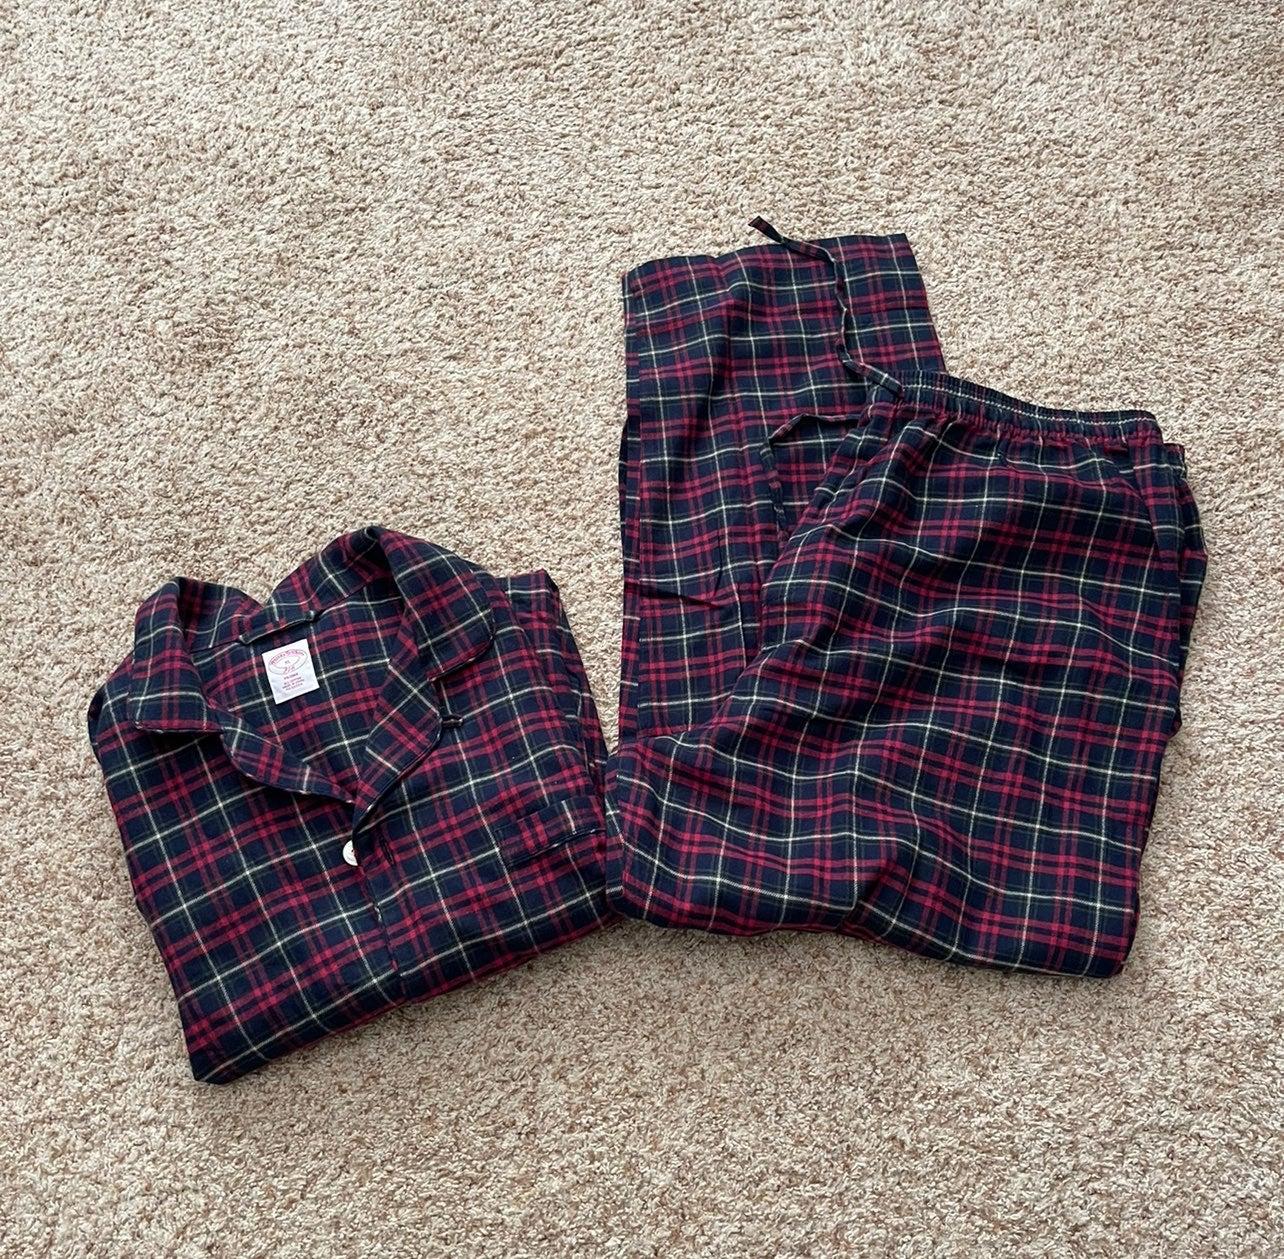 New Brooks brothers pajama set XL pjs